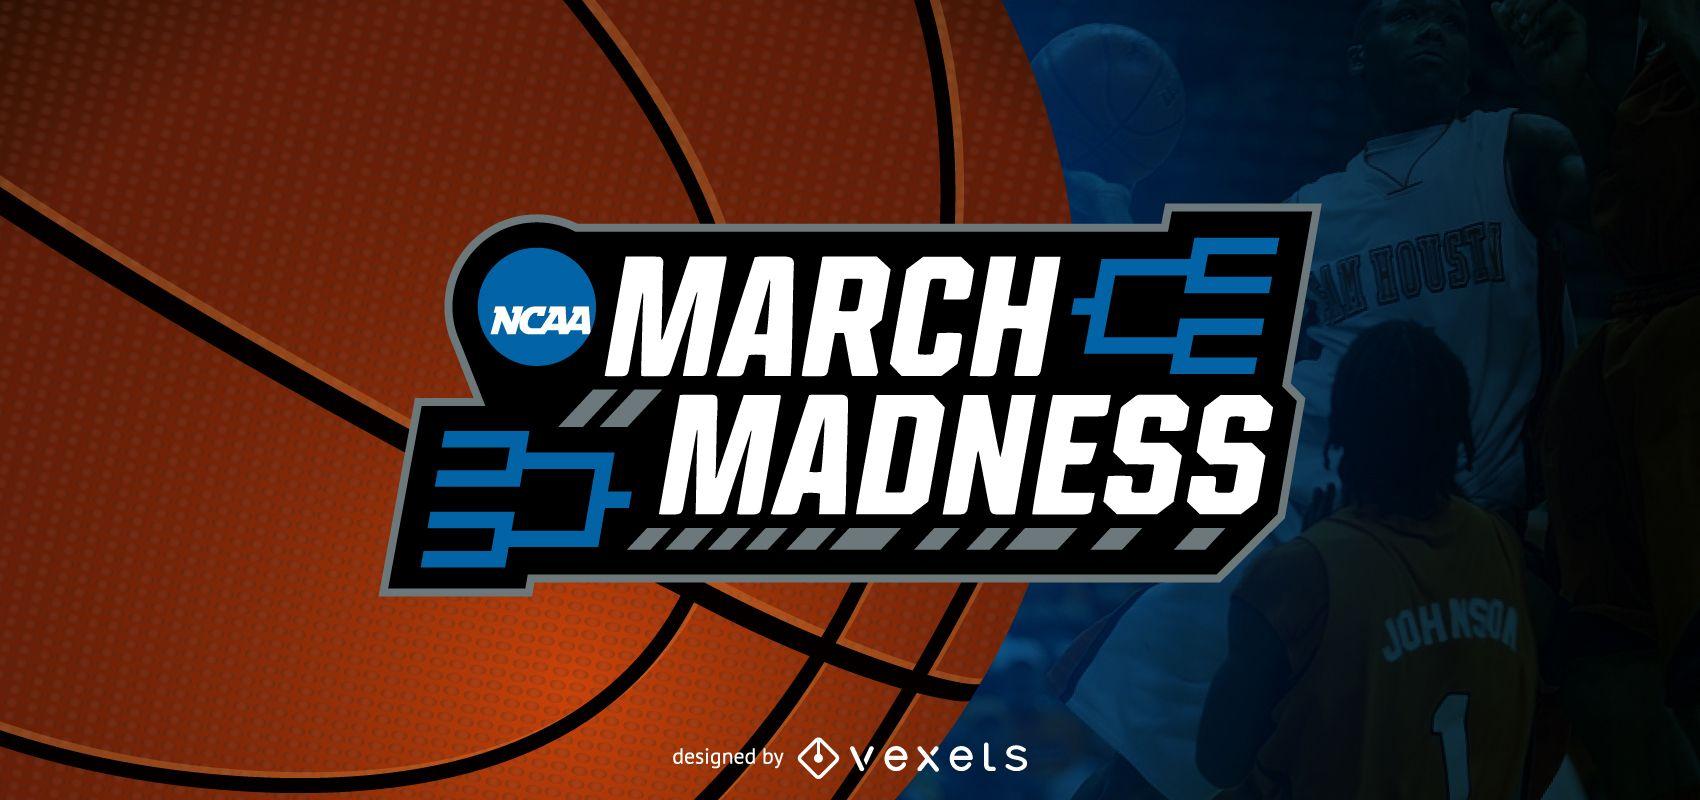 March Madness basketball blog header